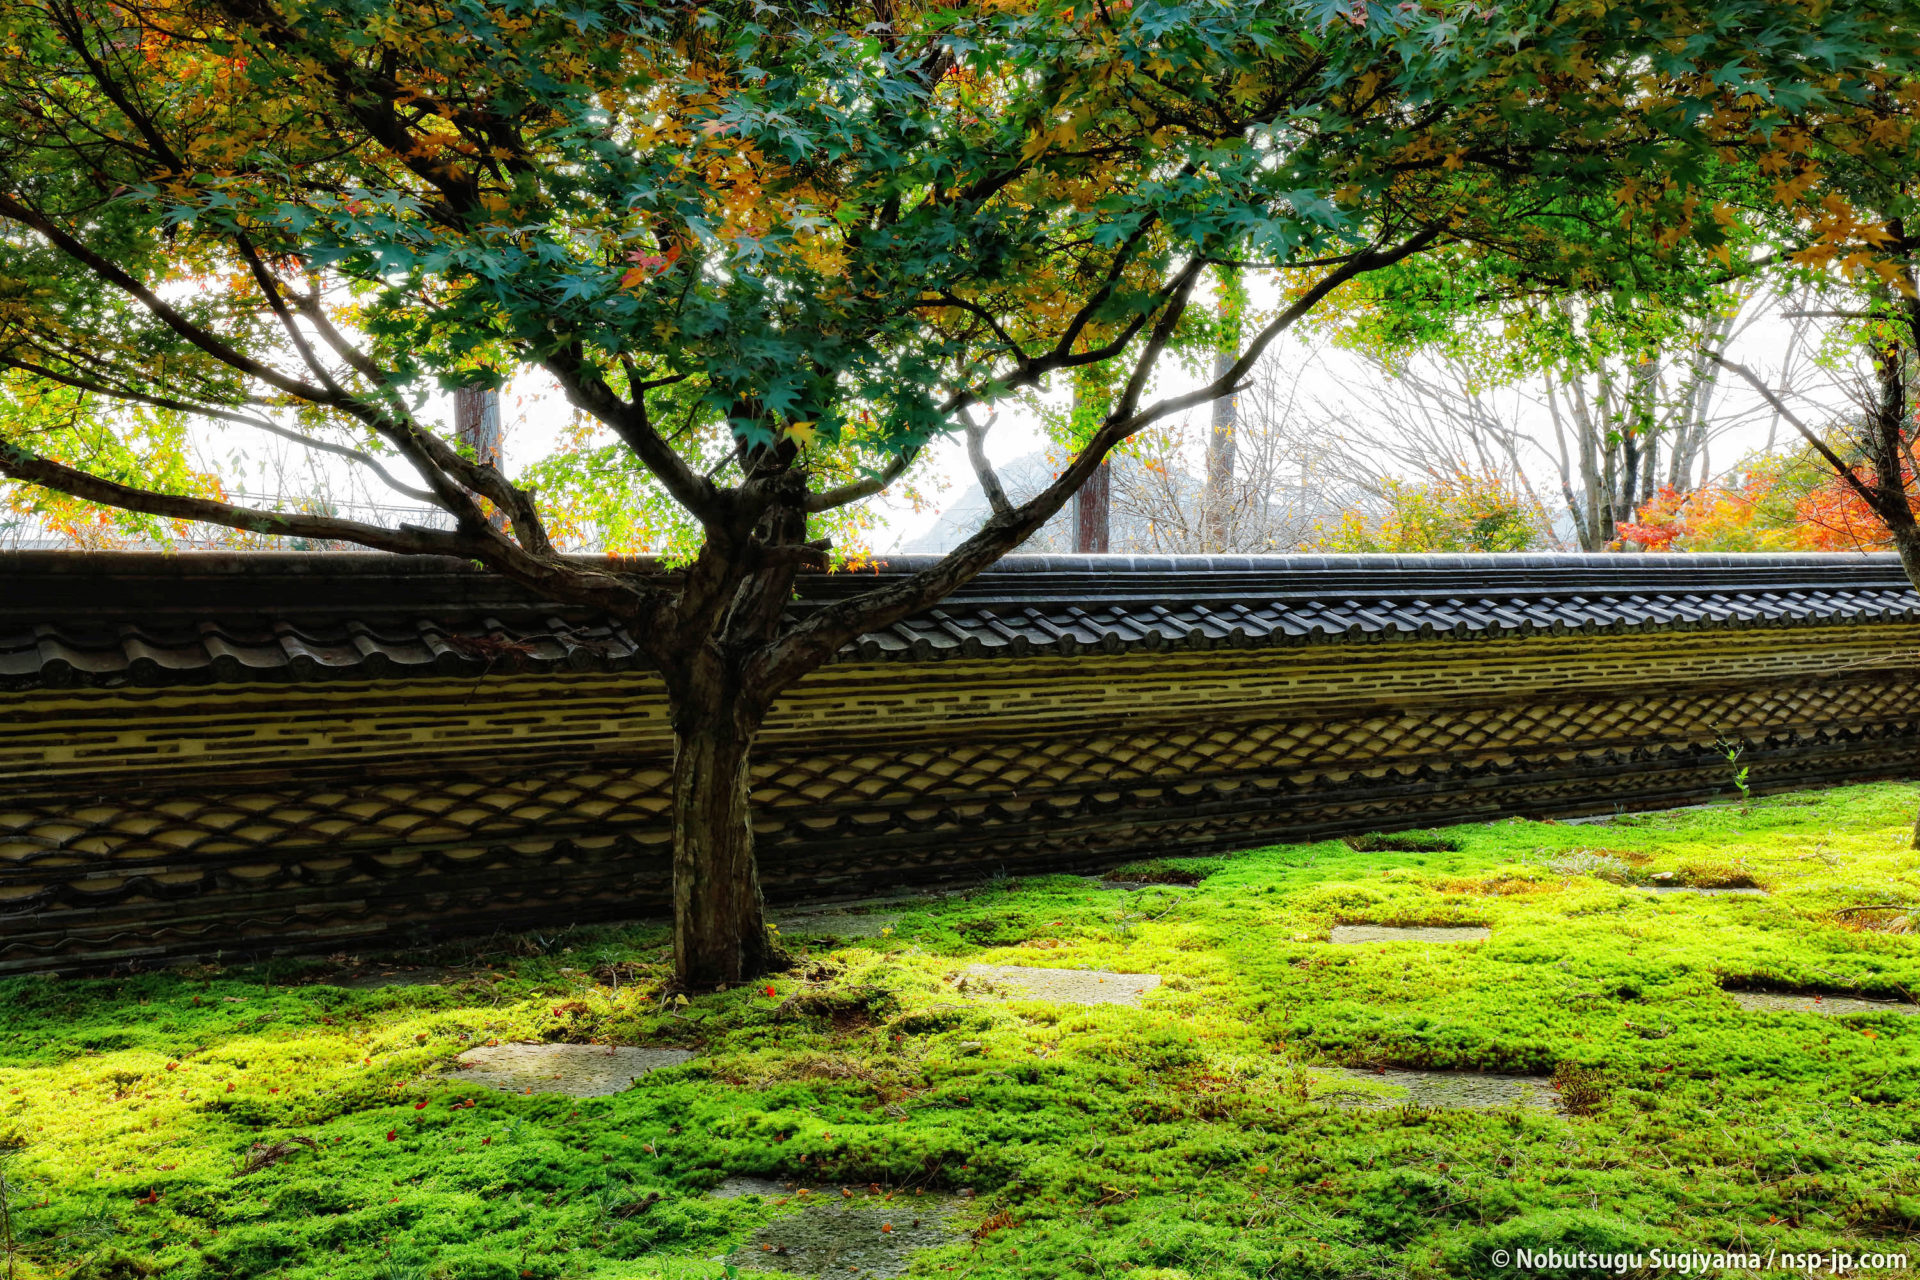 大智寺-瓦土塀と無相の庭 | 岐阜 故郷巡礼 by 杉山宣嗣